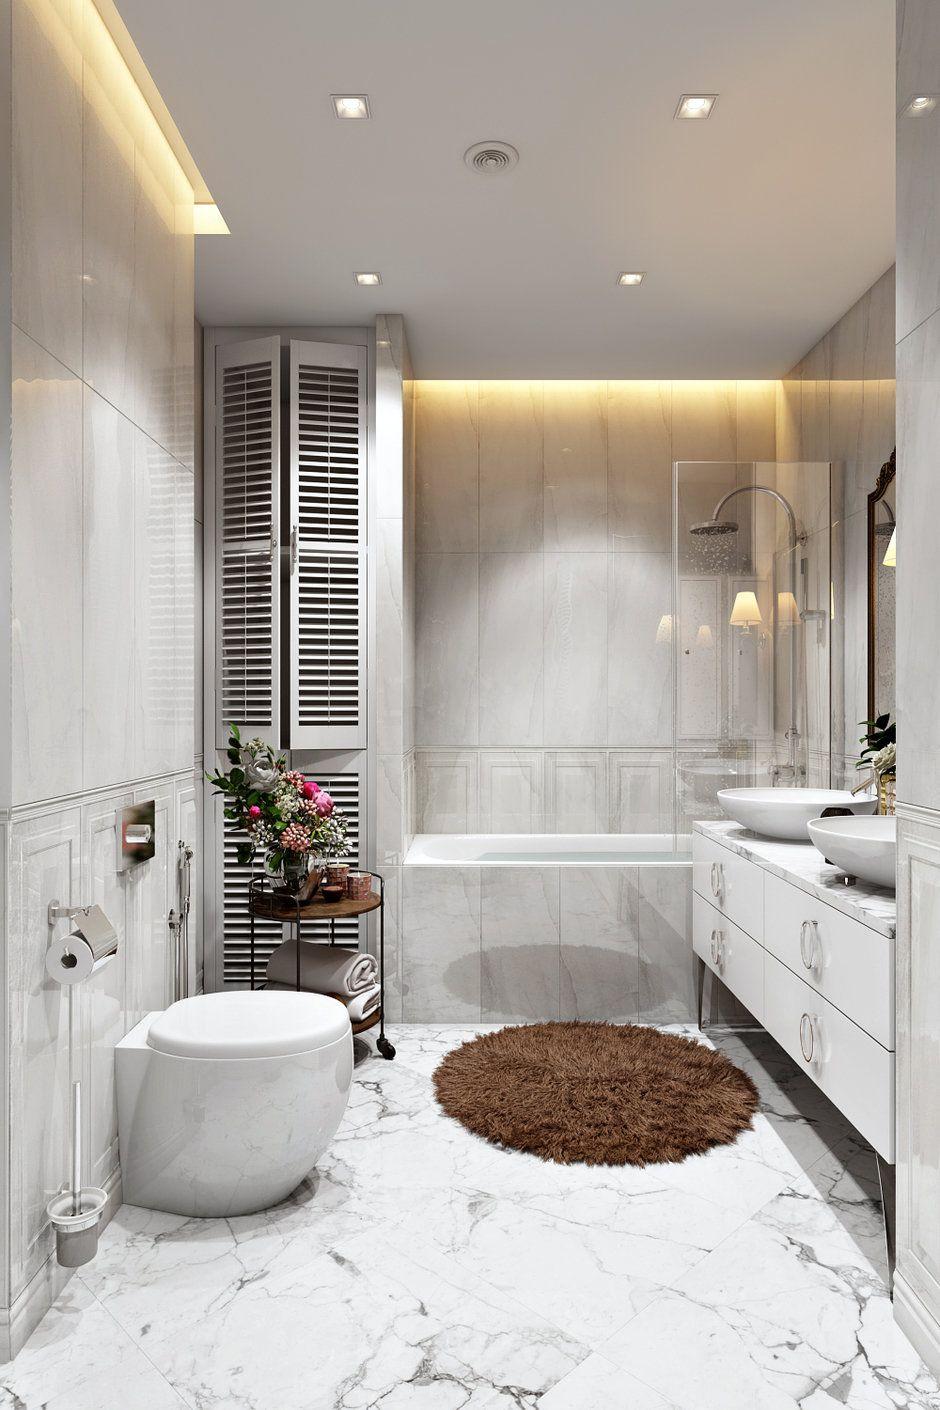 интерьер ванной комнаты фото 17